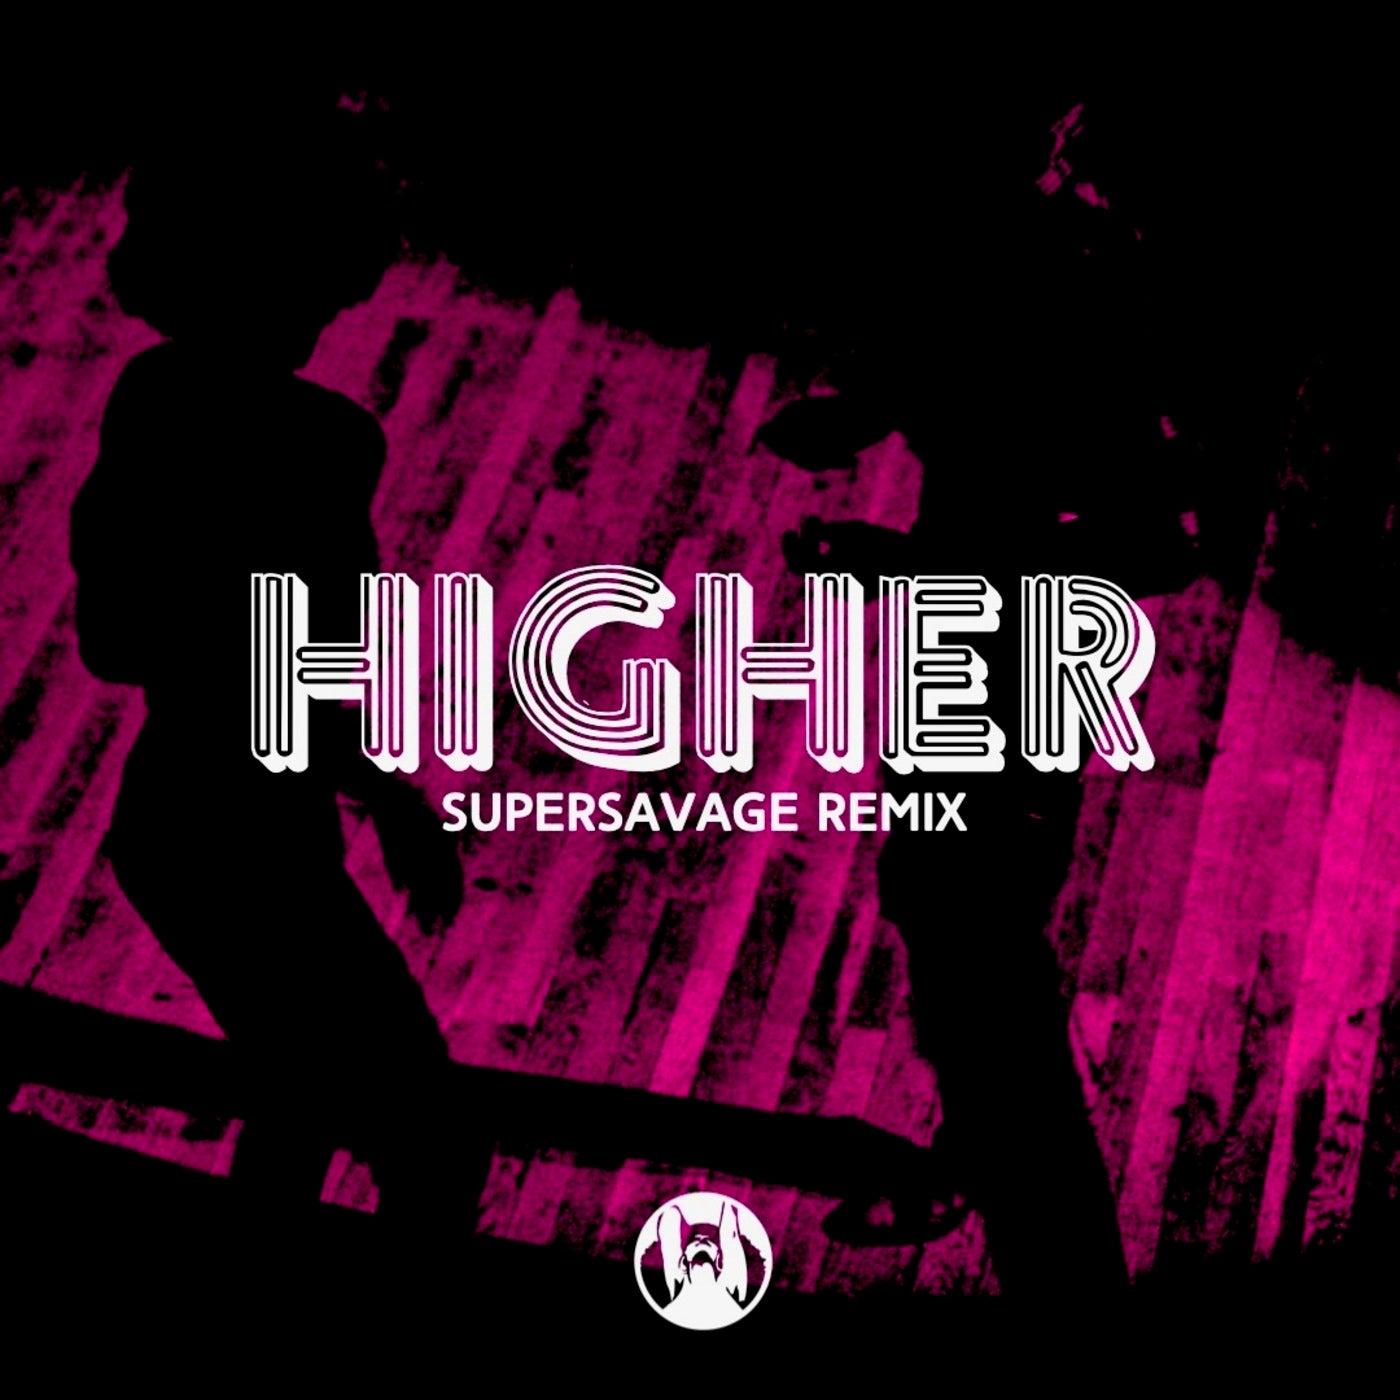 Higher (Supersavage Remix)